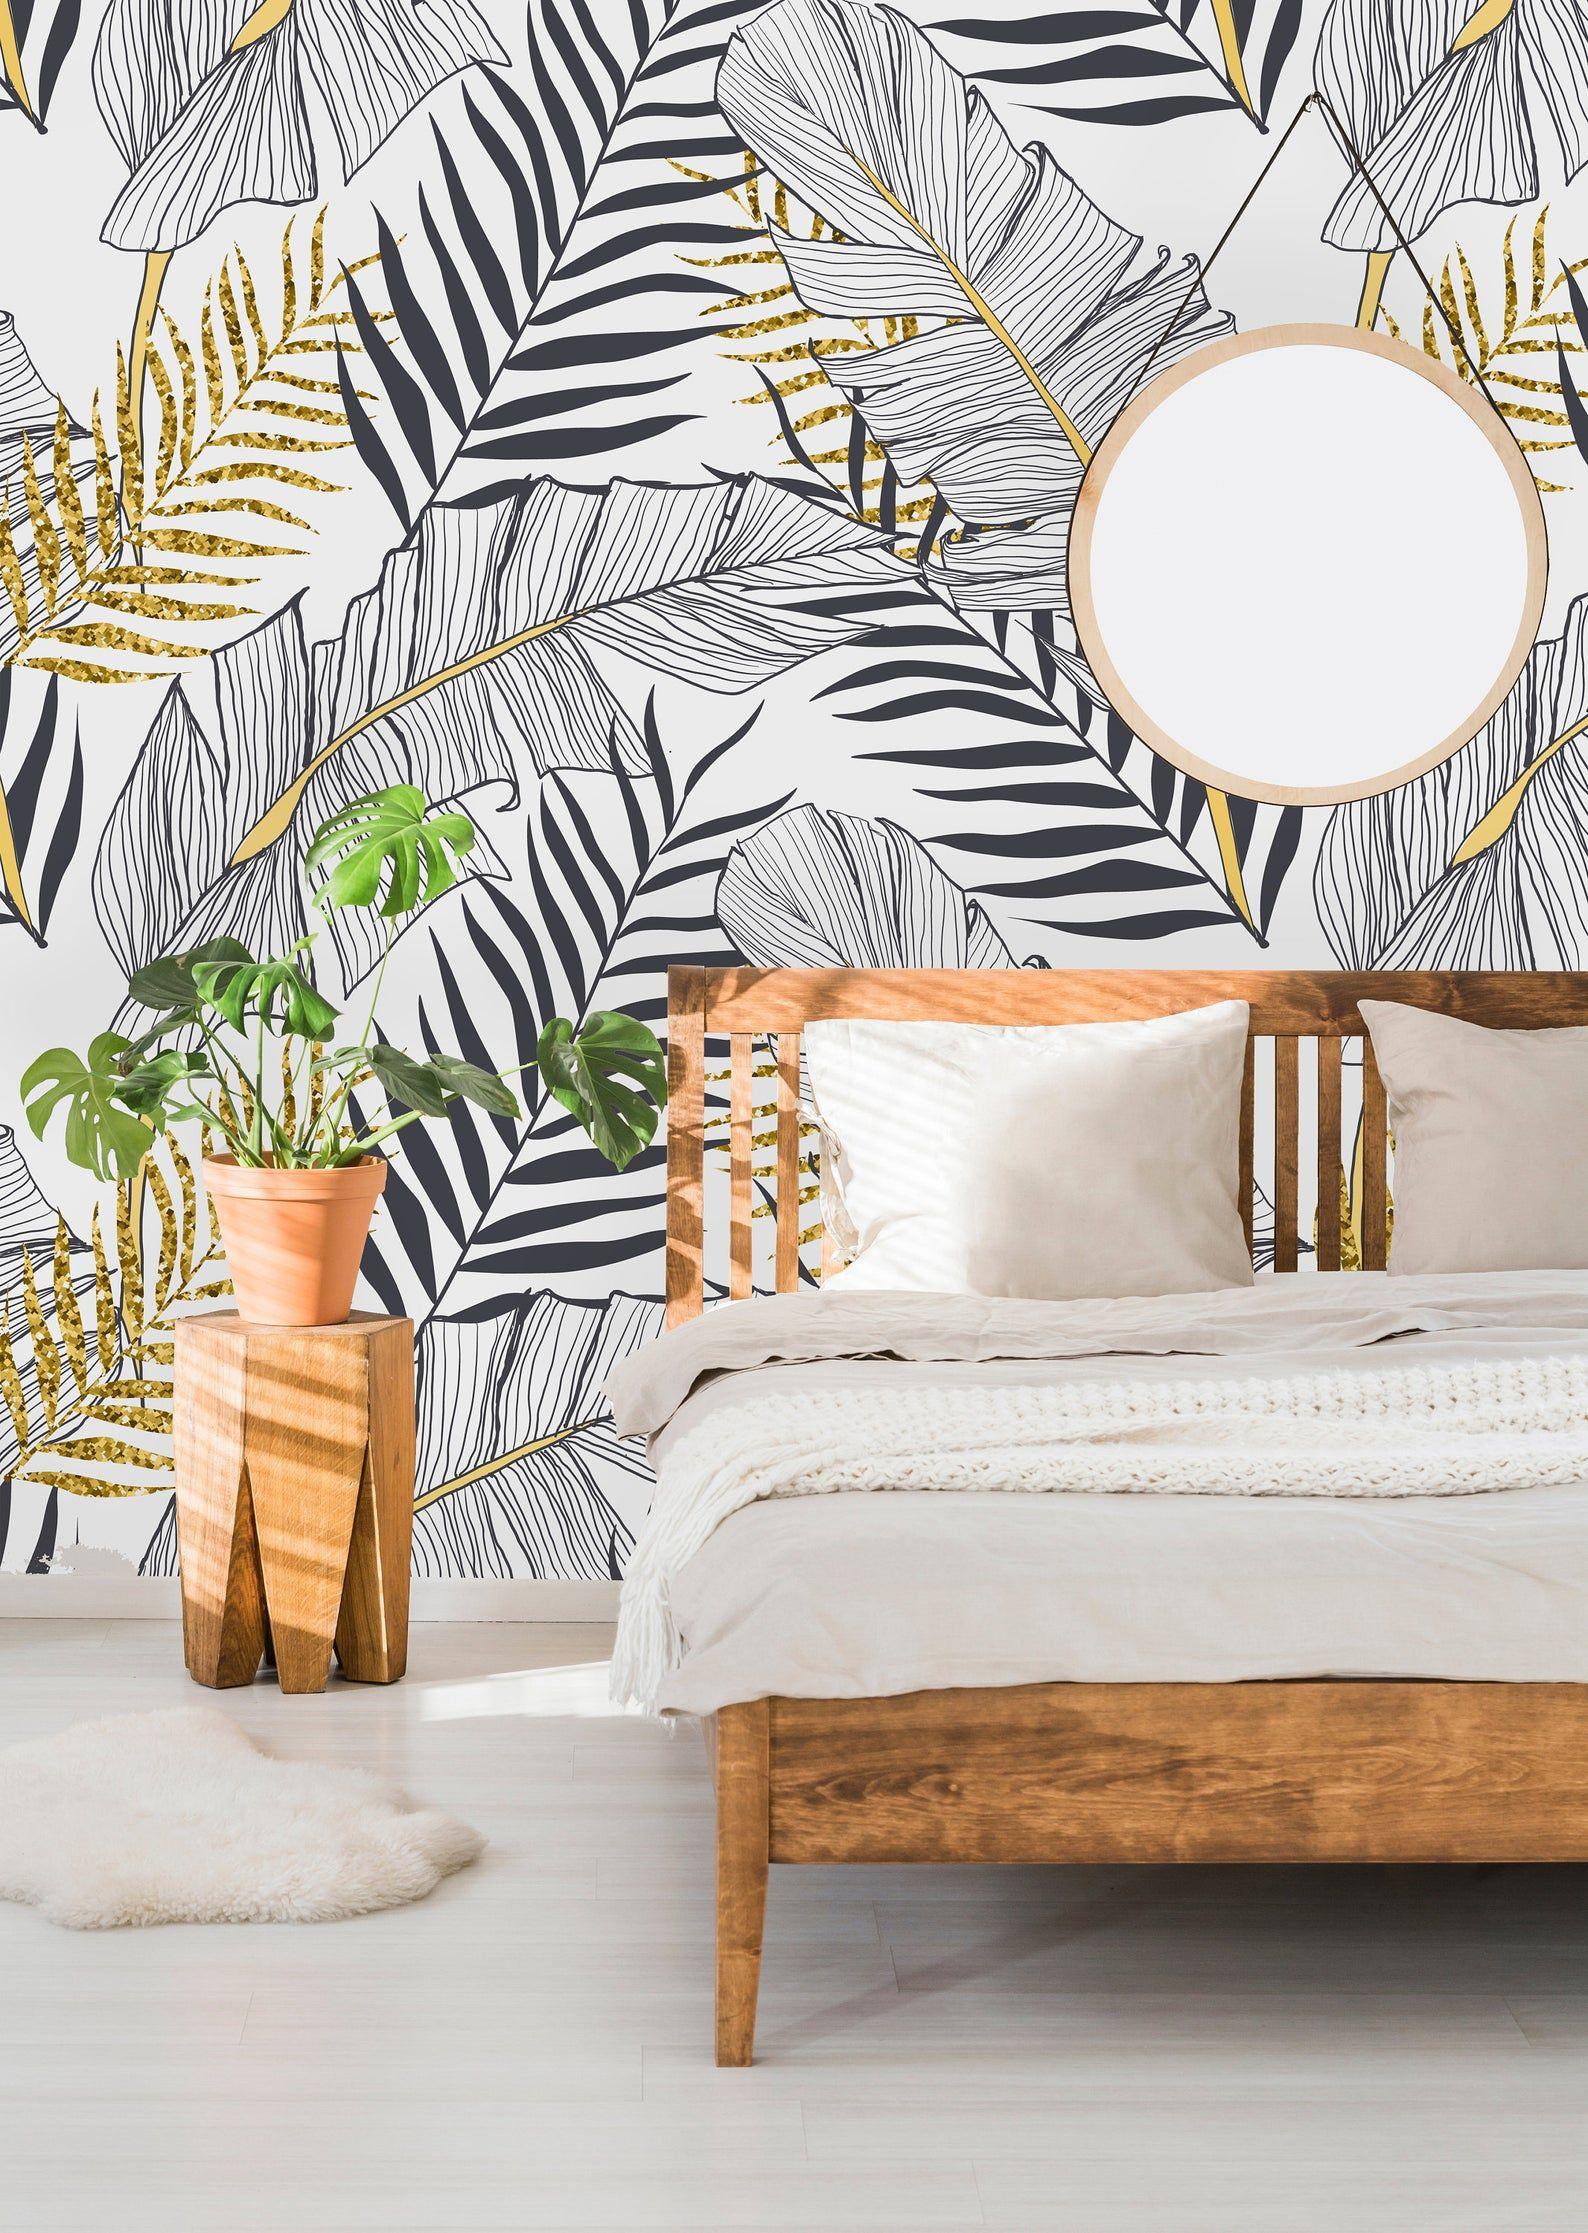 Removable Wallpaper Self Adhesive Wallpaper Tropical Gold Leaves Peel Stick Wallpaper Mural Papier Peint Peinture Murale Decoration Salon Gris